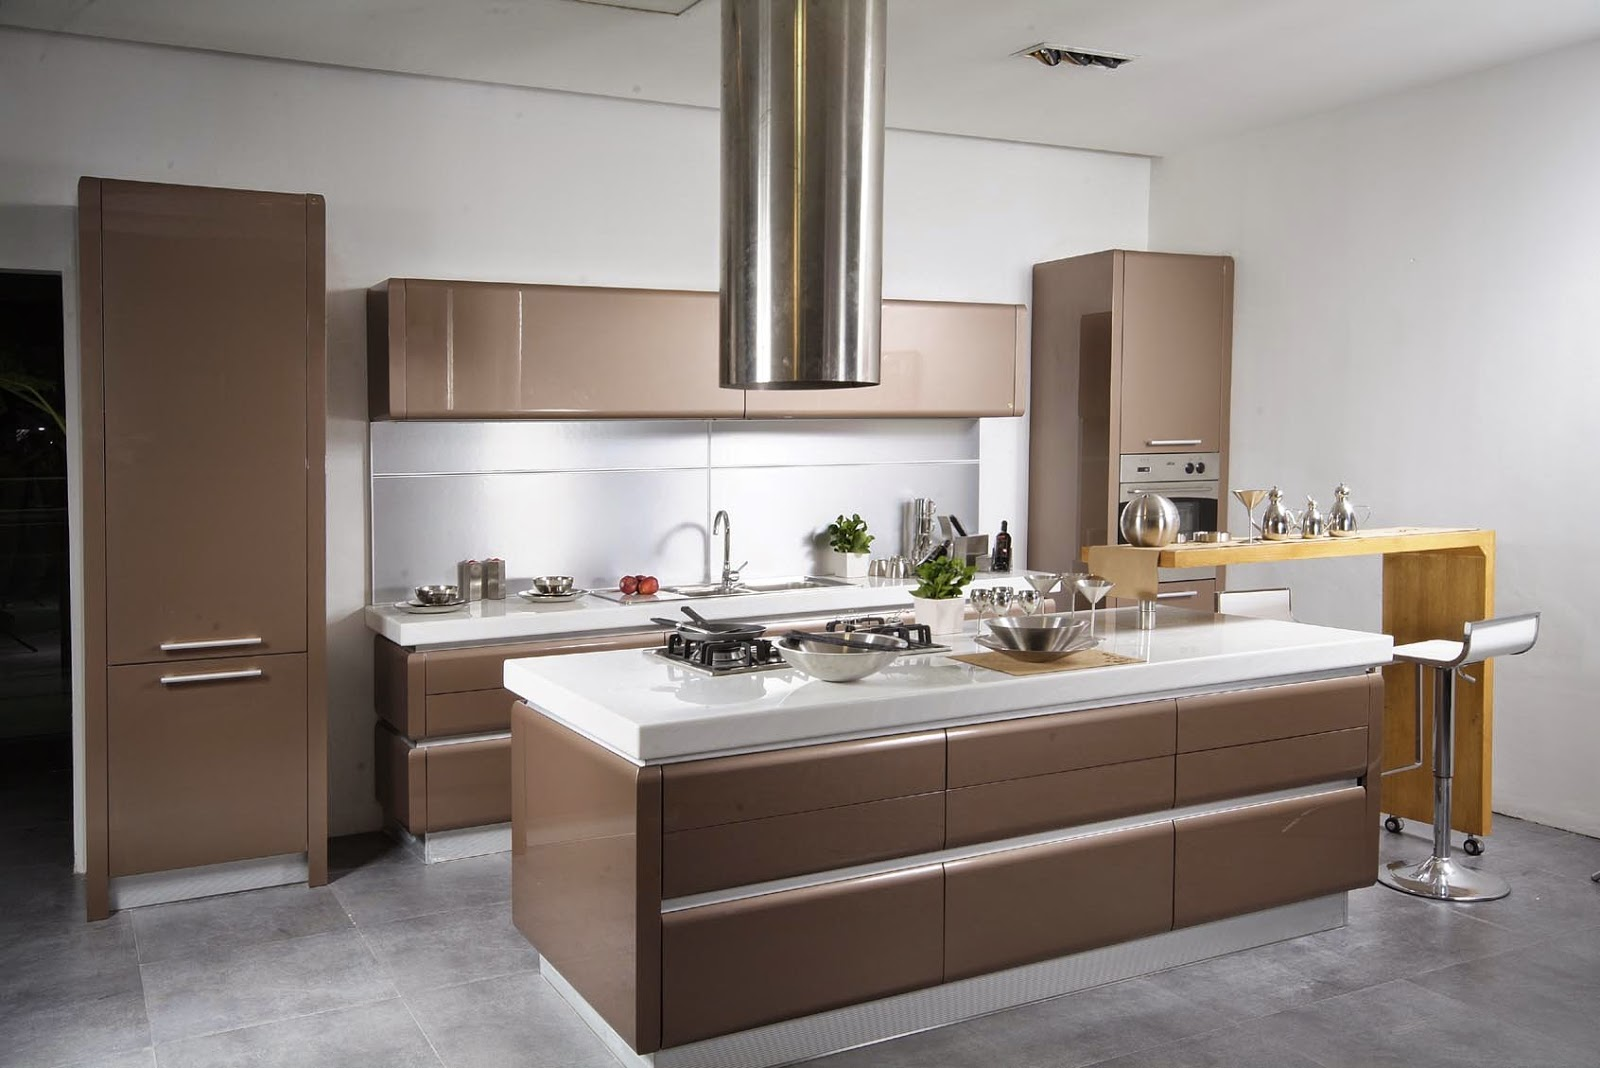 Cuisine design petite surface